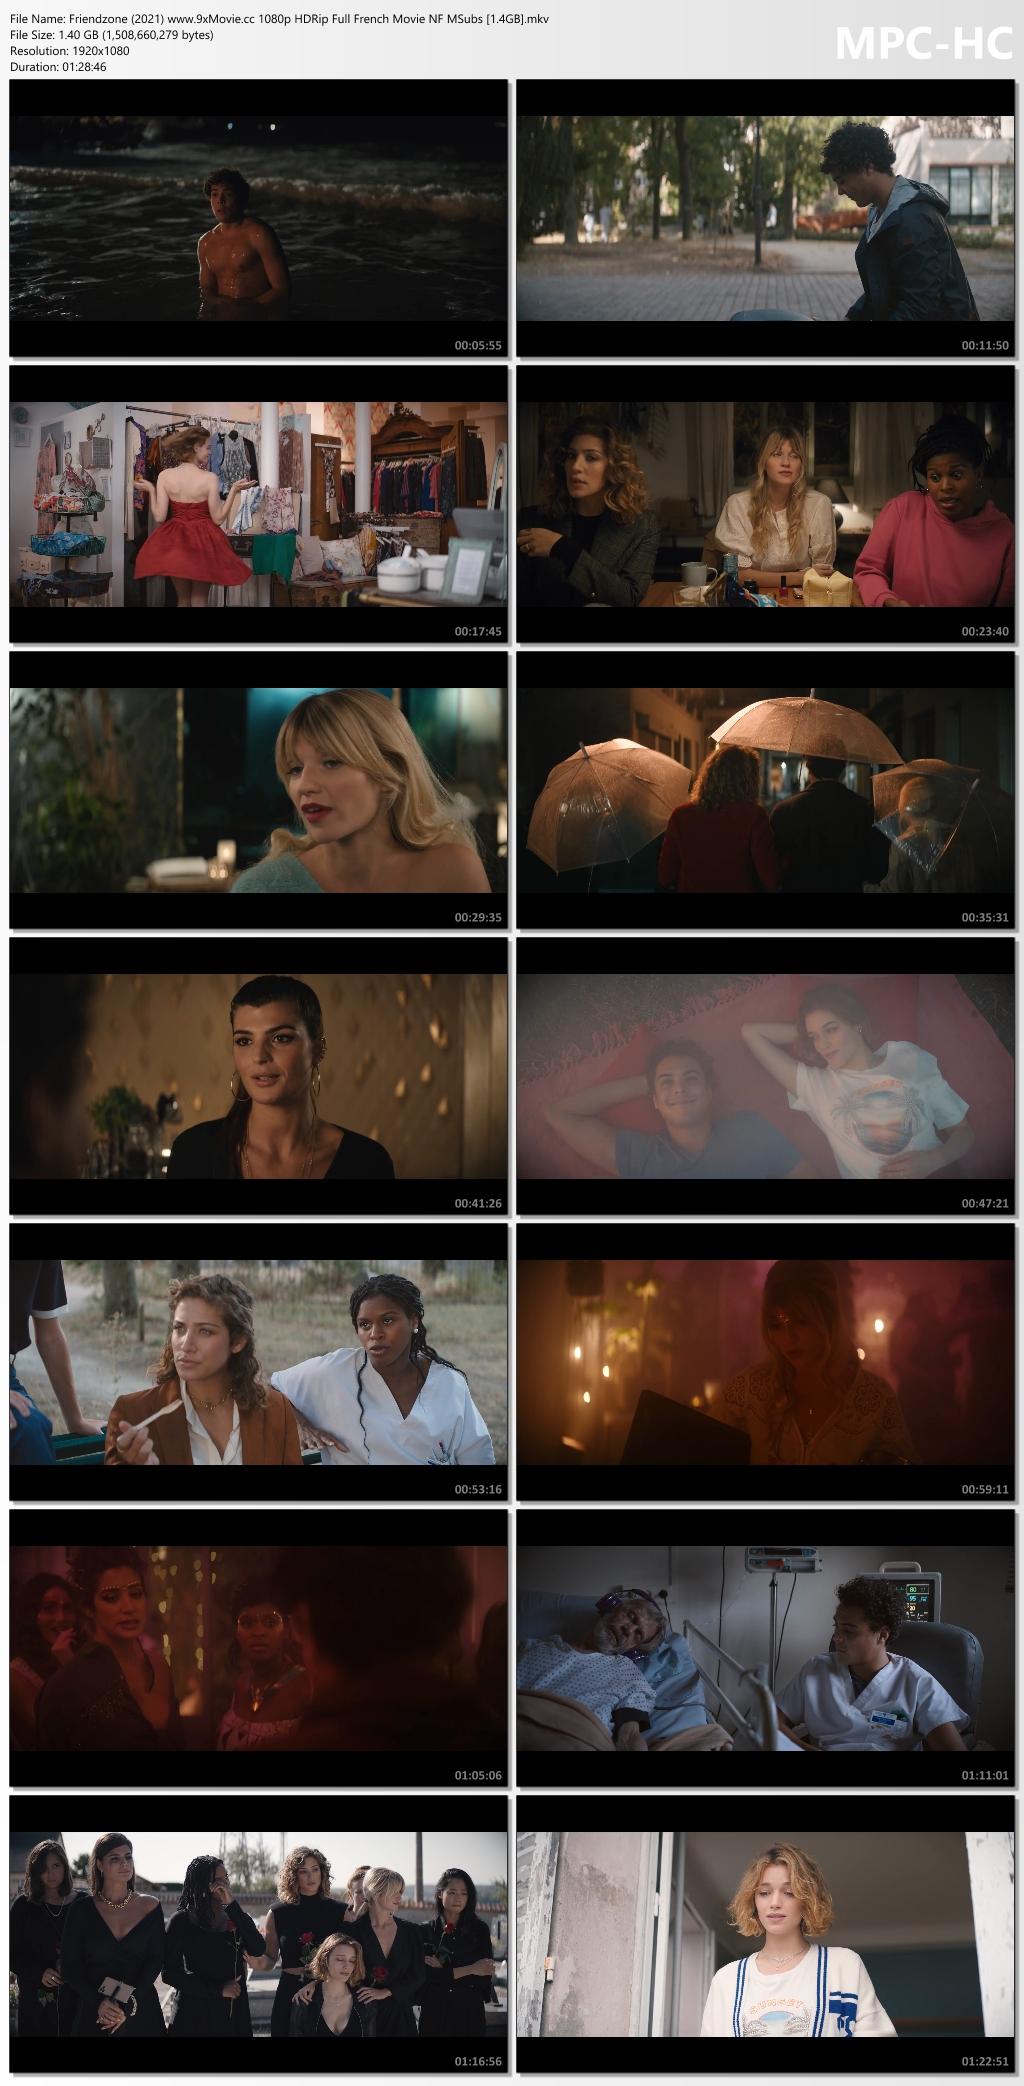 Friendzone-2021-www-9x-Movie-cc-1080p-HDRip-Full-French-Movie-NF-MSubs-1-4-GB-mkv